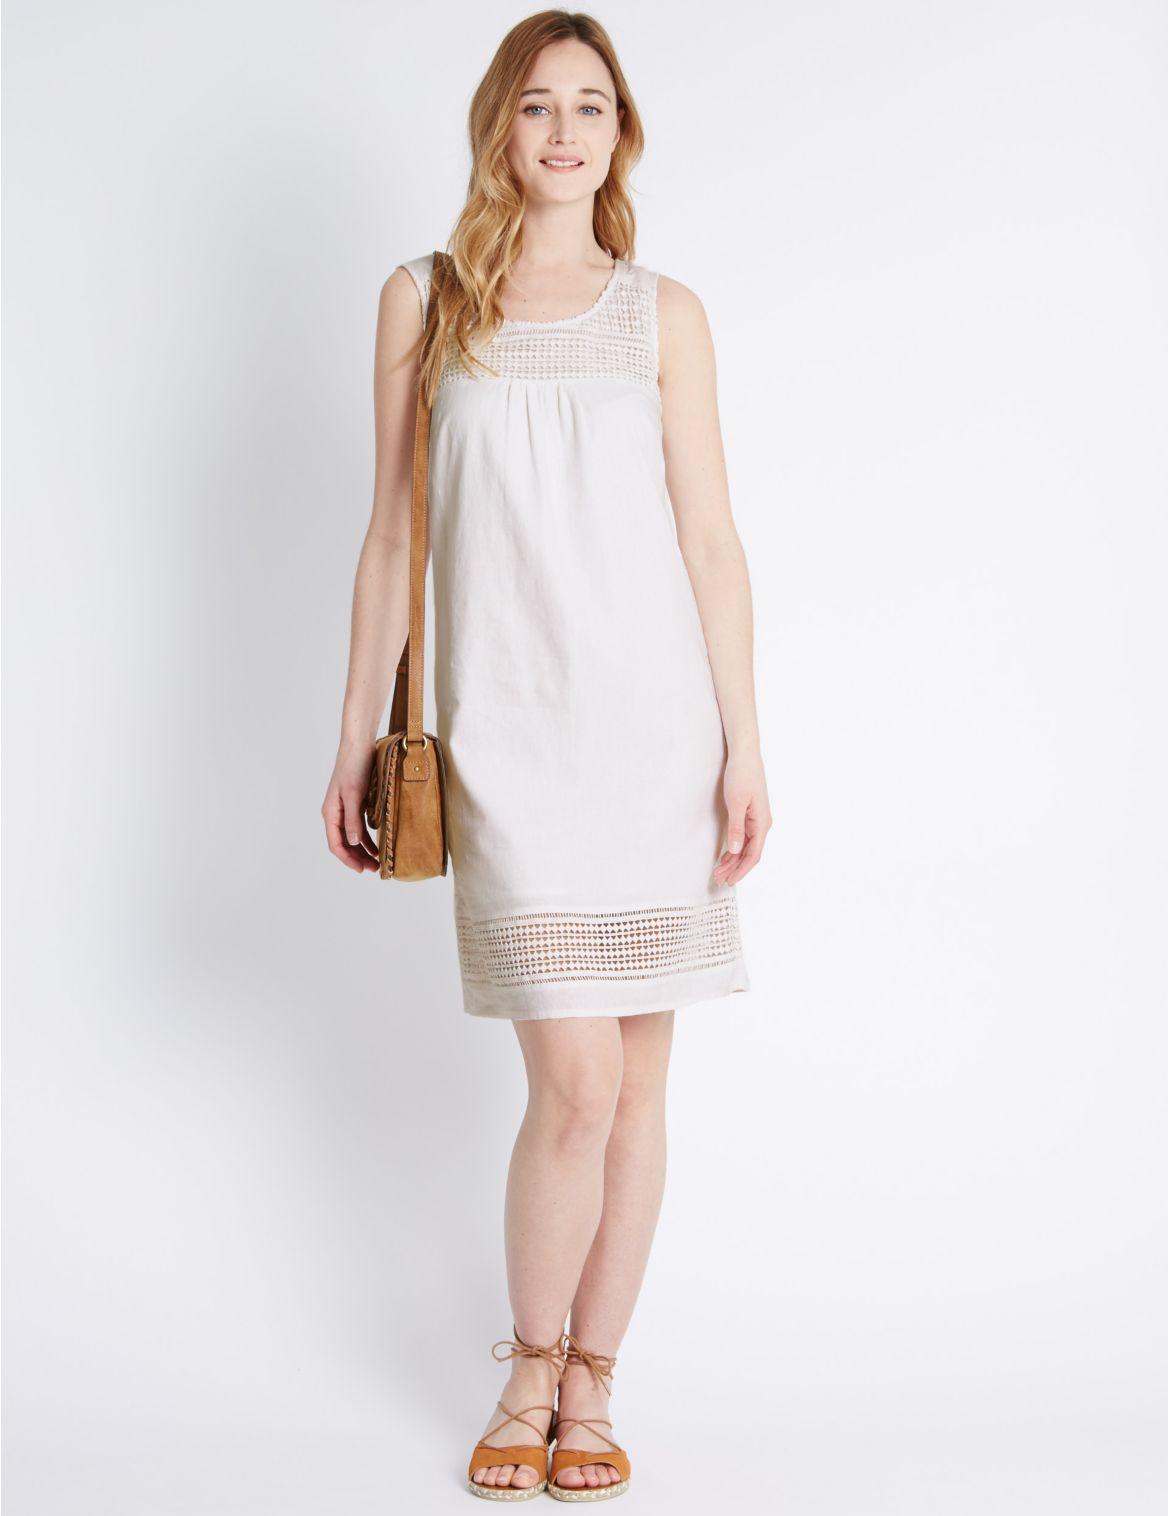 Mouwloze rechte jurk van linnenmix